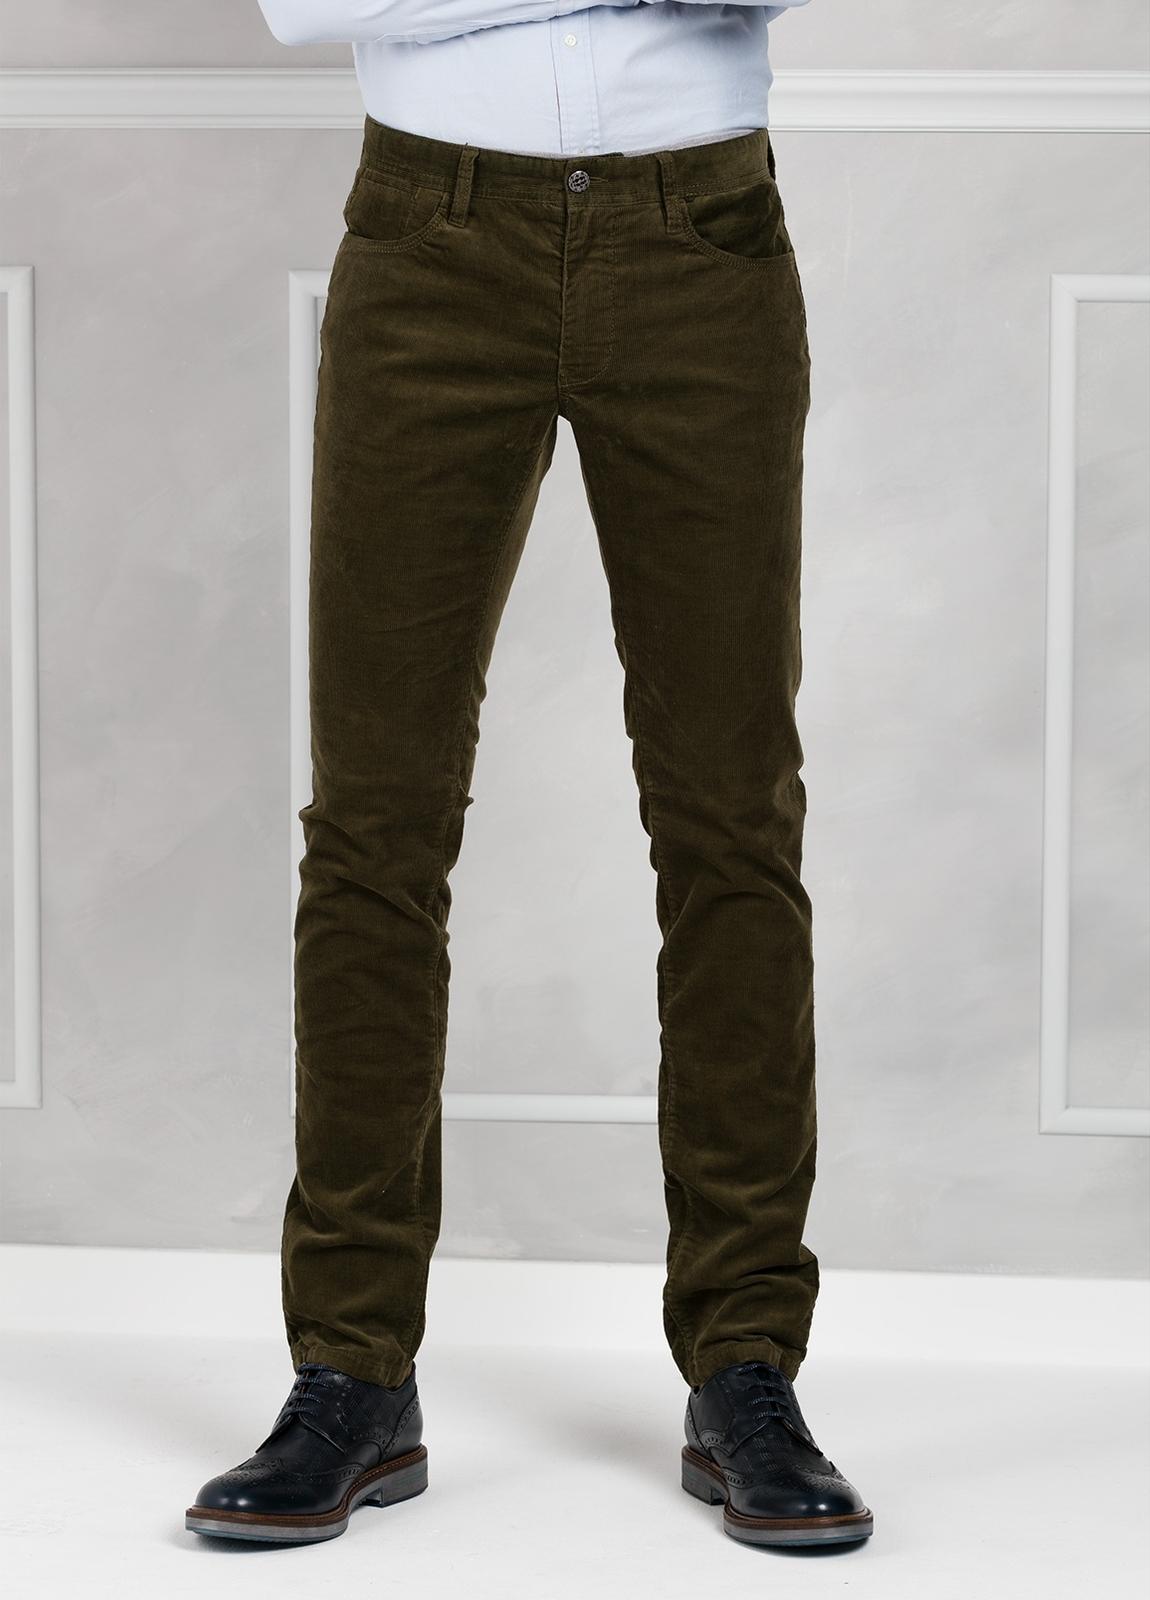 Pantalón 5 bolsillos micropana modelo FRED color kaki. 98% Algodón 2% Elastano.